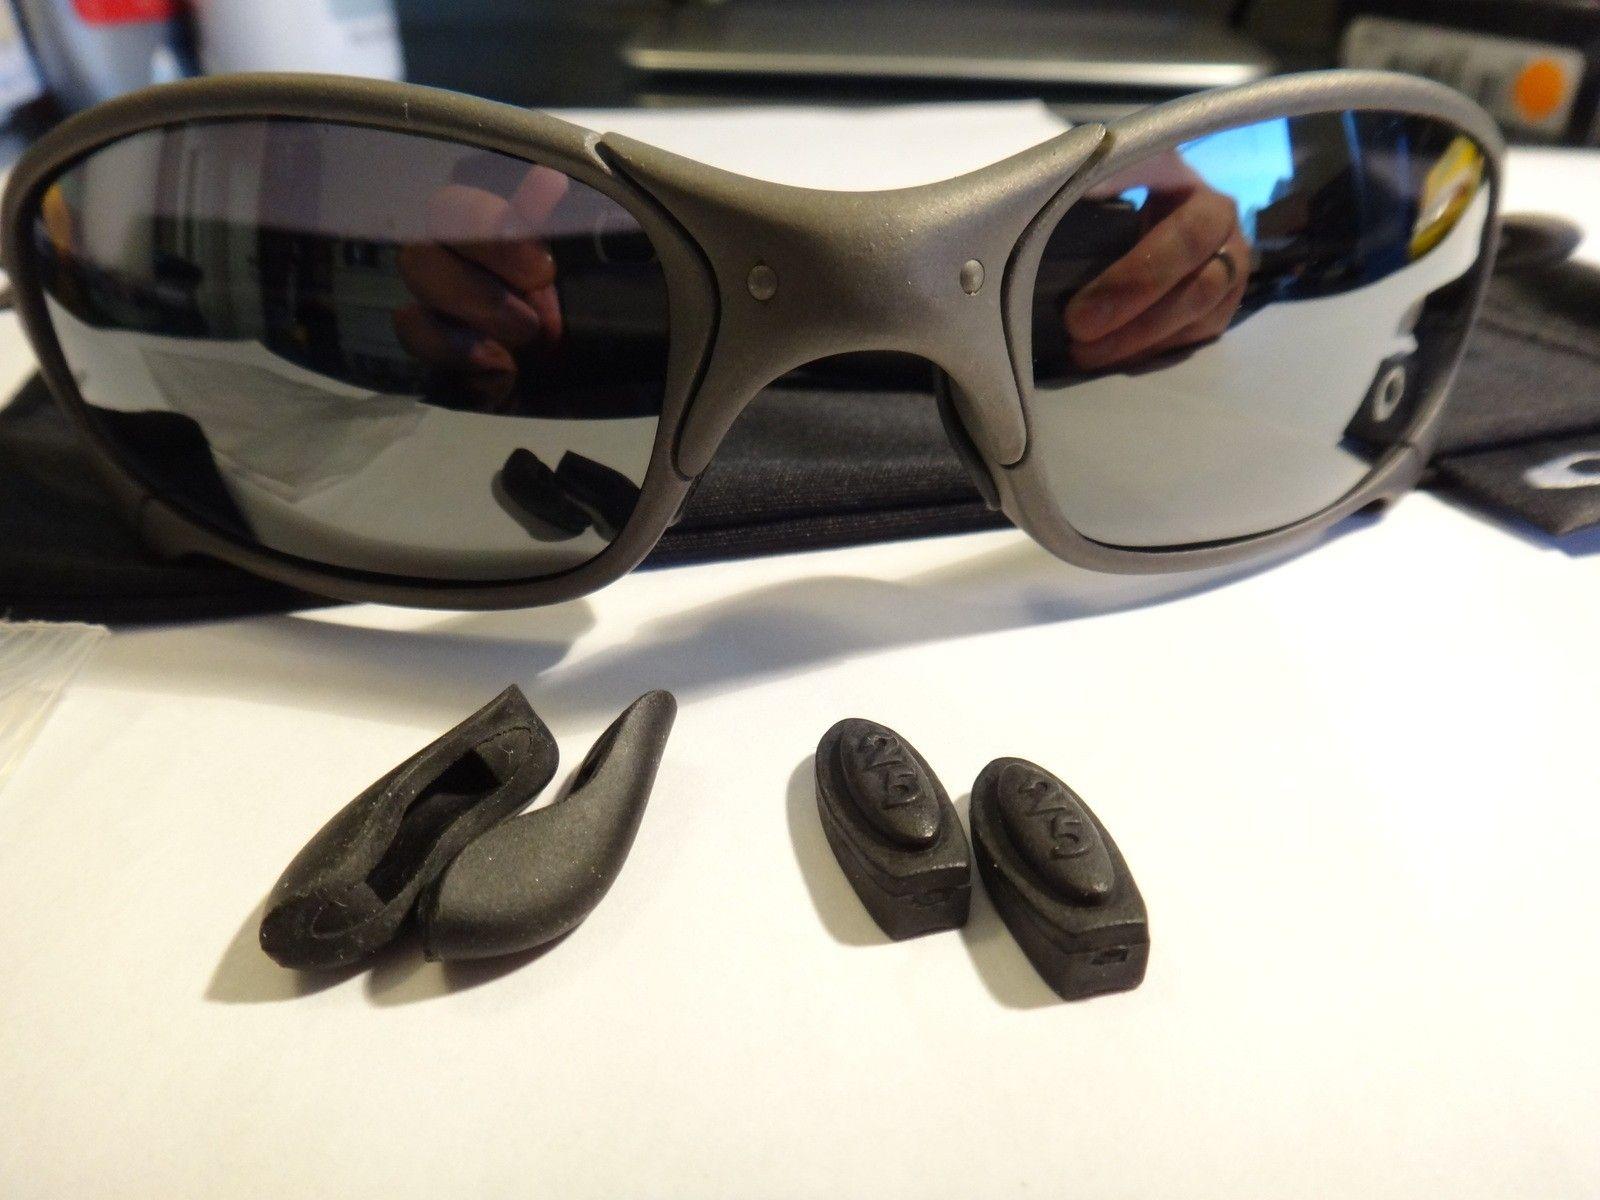 1st gen juliet, Juliet ruby lenses, snow goggle lens (A frame), juliet parts, wallet, boots - DSC07303.JPG